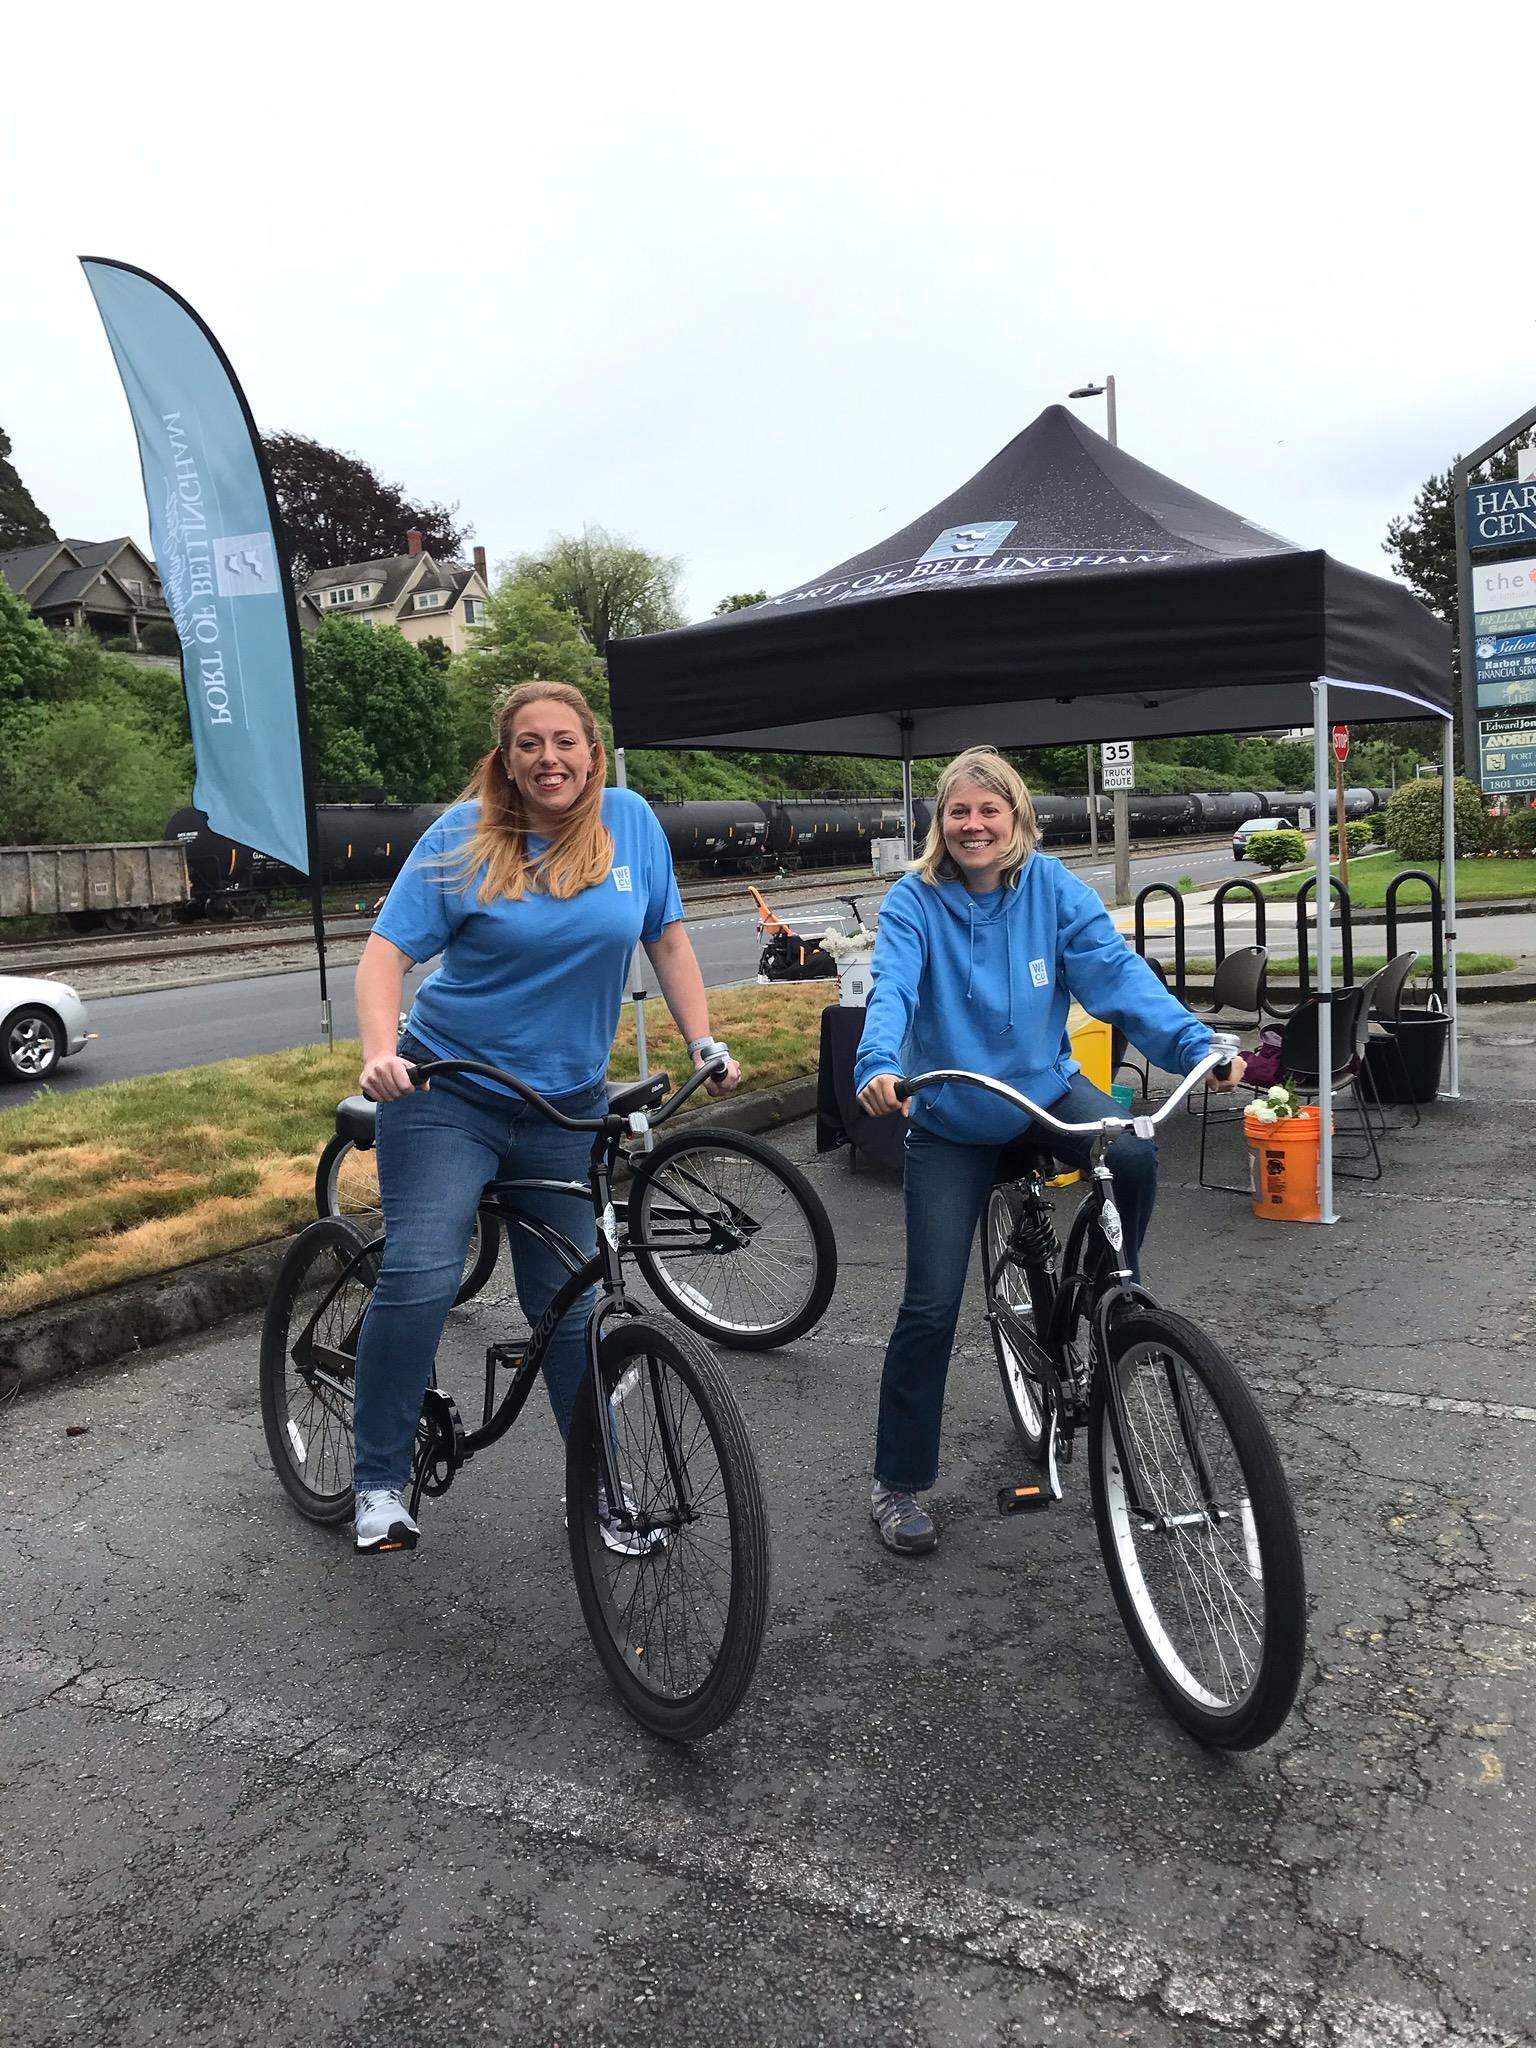 Team WECU Volunteers at the 2019 Bike to Work Day.